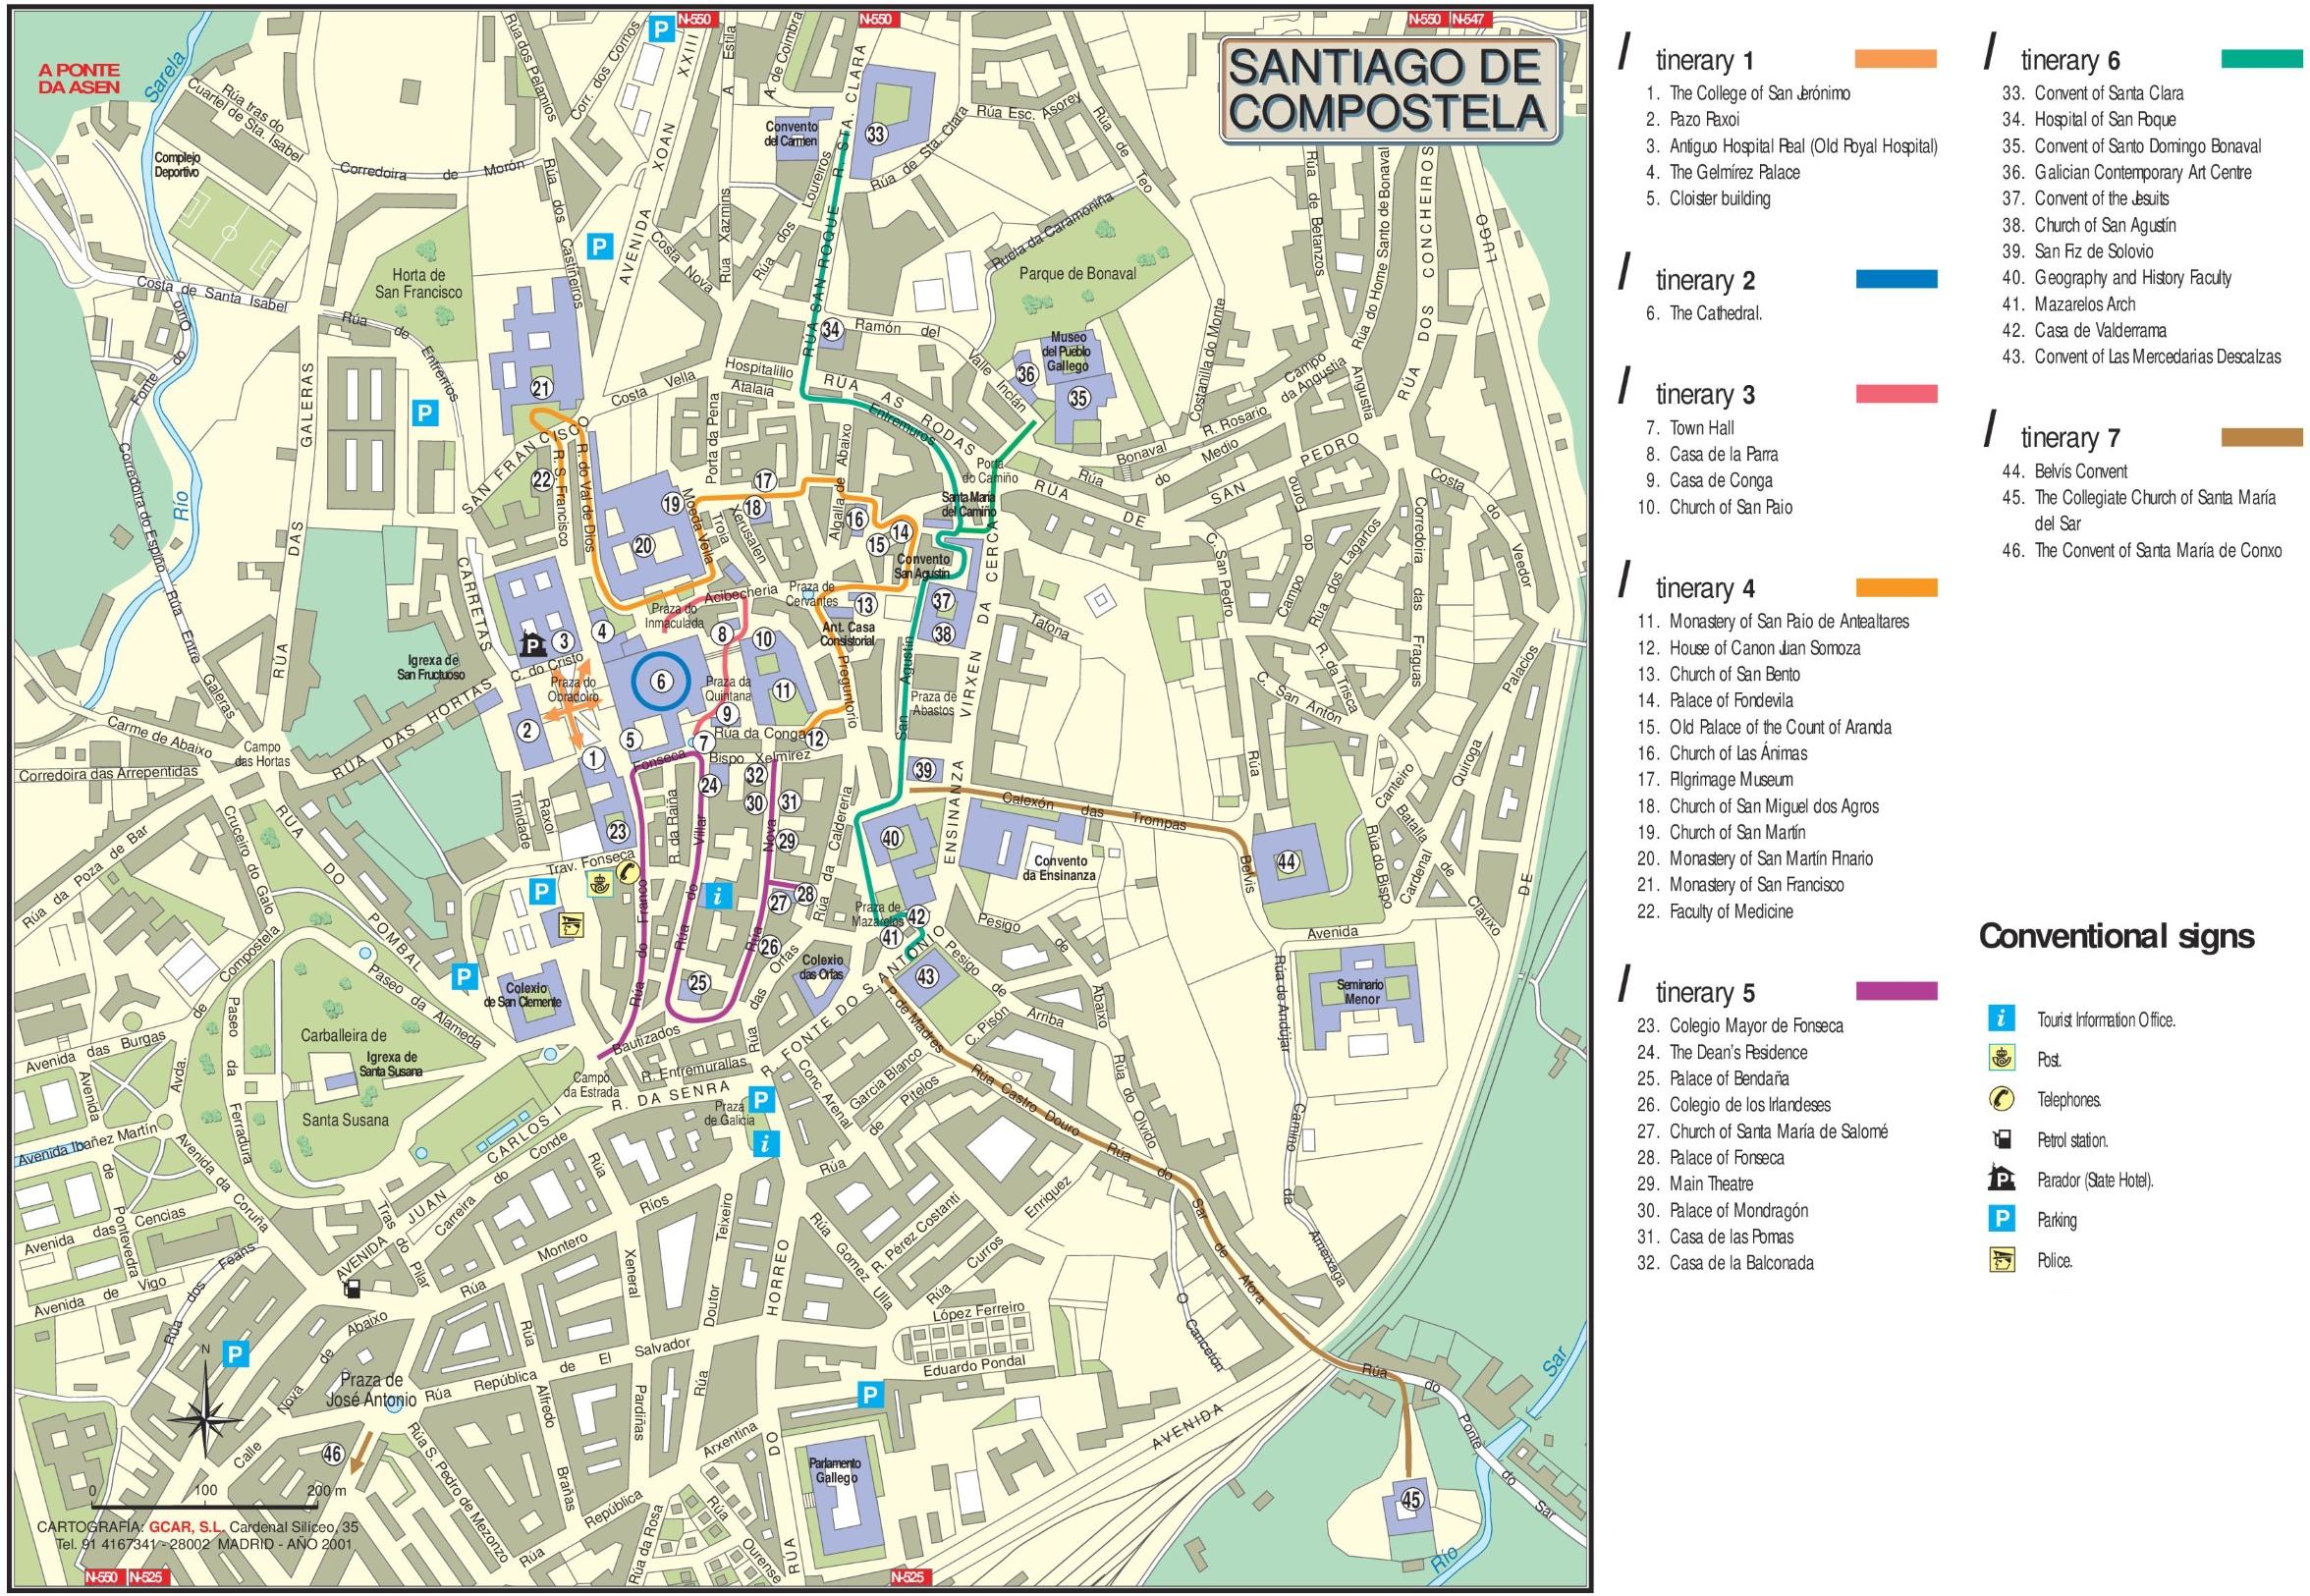 Santiago de Compostela city center map